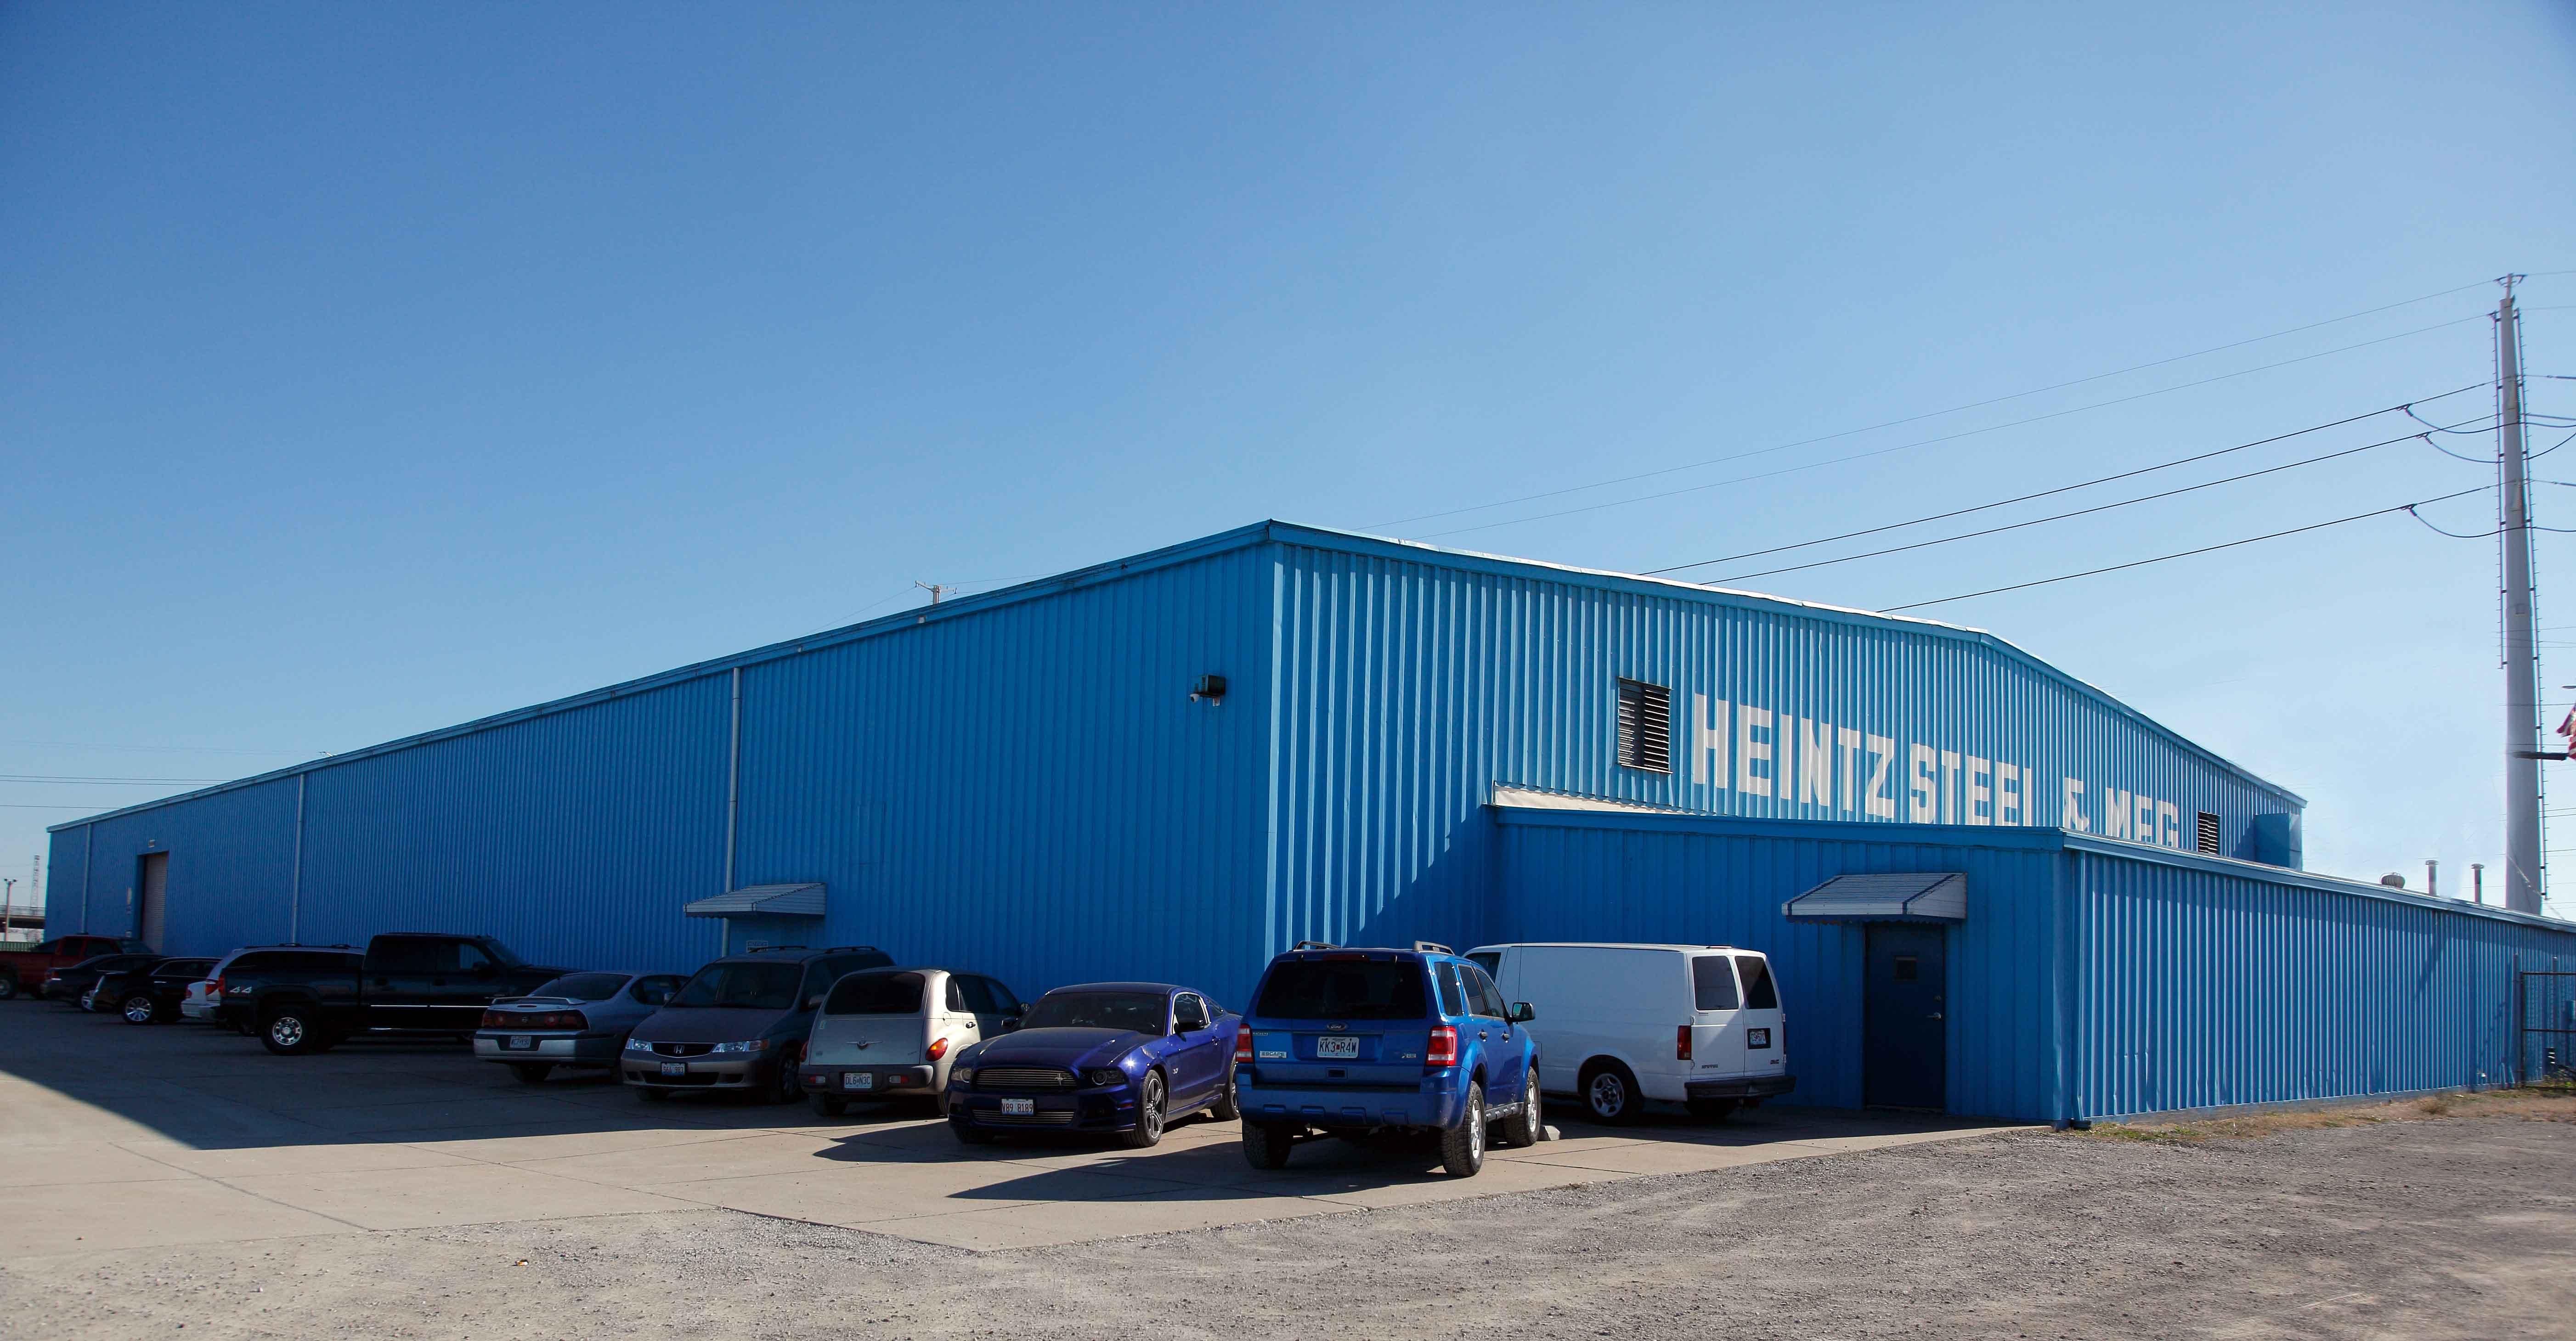 Steel Products Manufacturing : Heintz steel manufacturing company custom metal